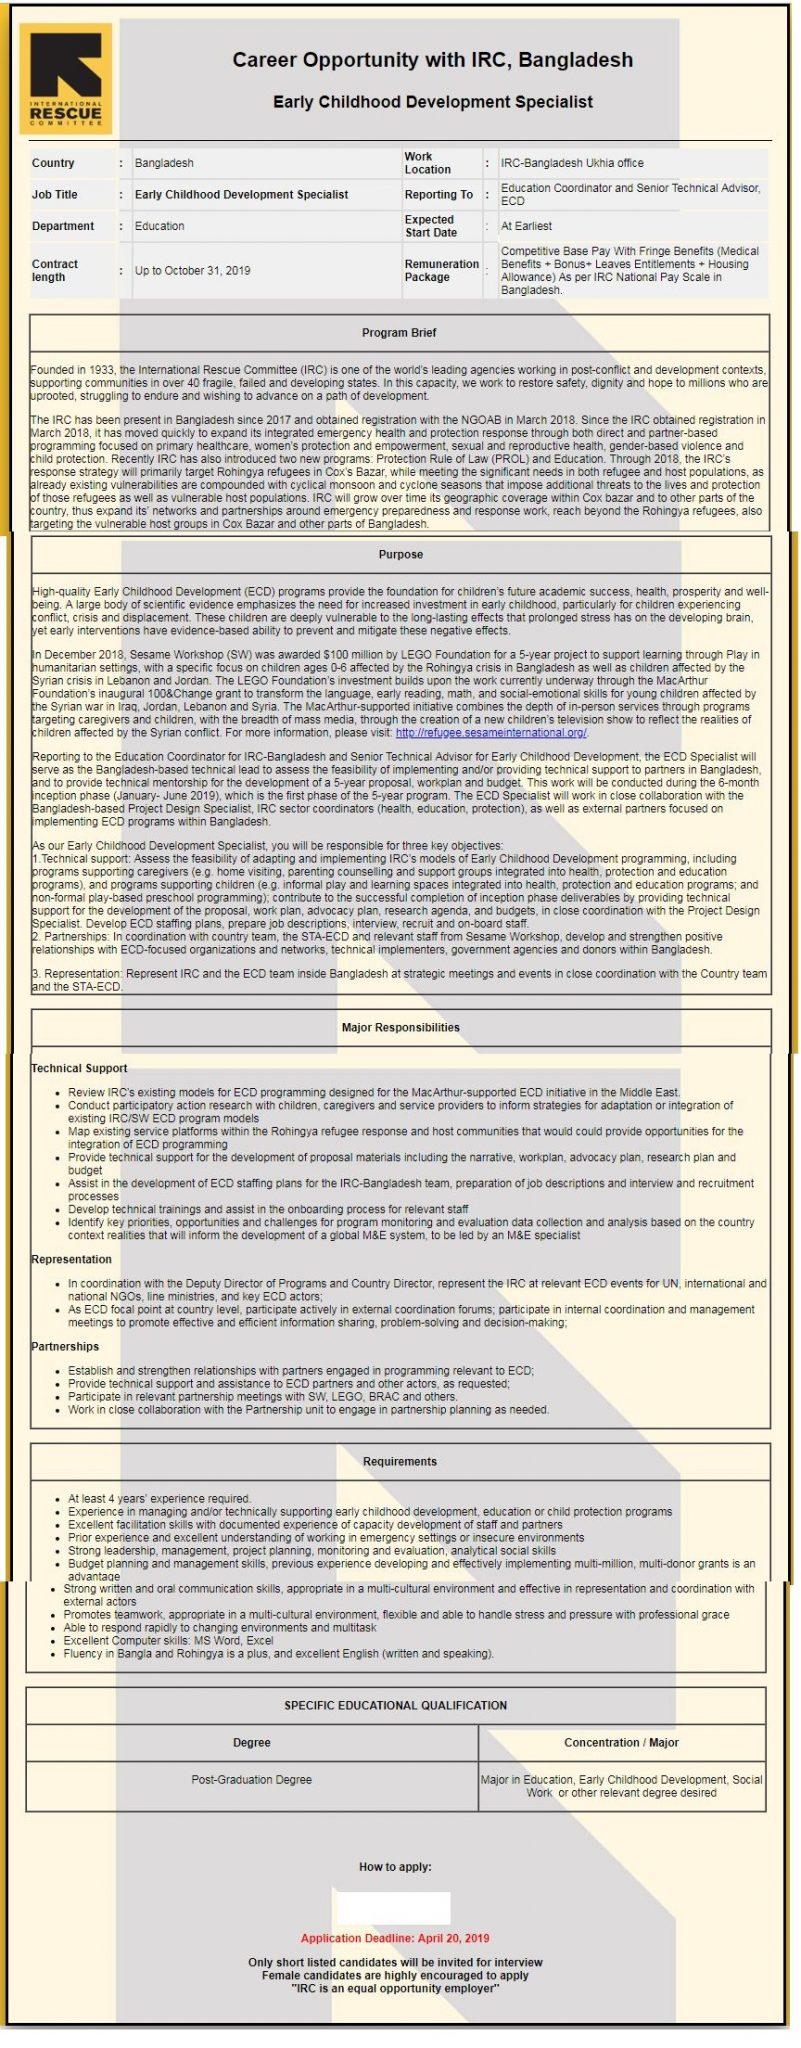 International Rescue Committee job circular 2019